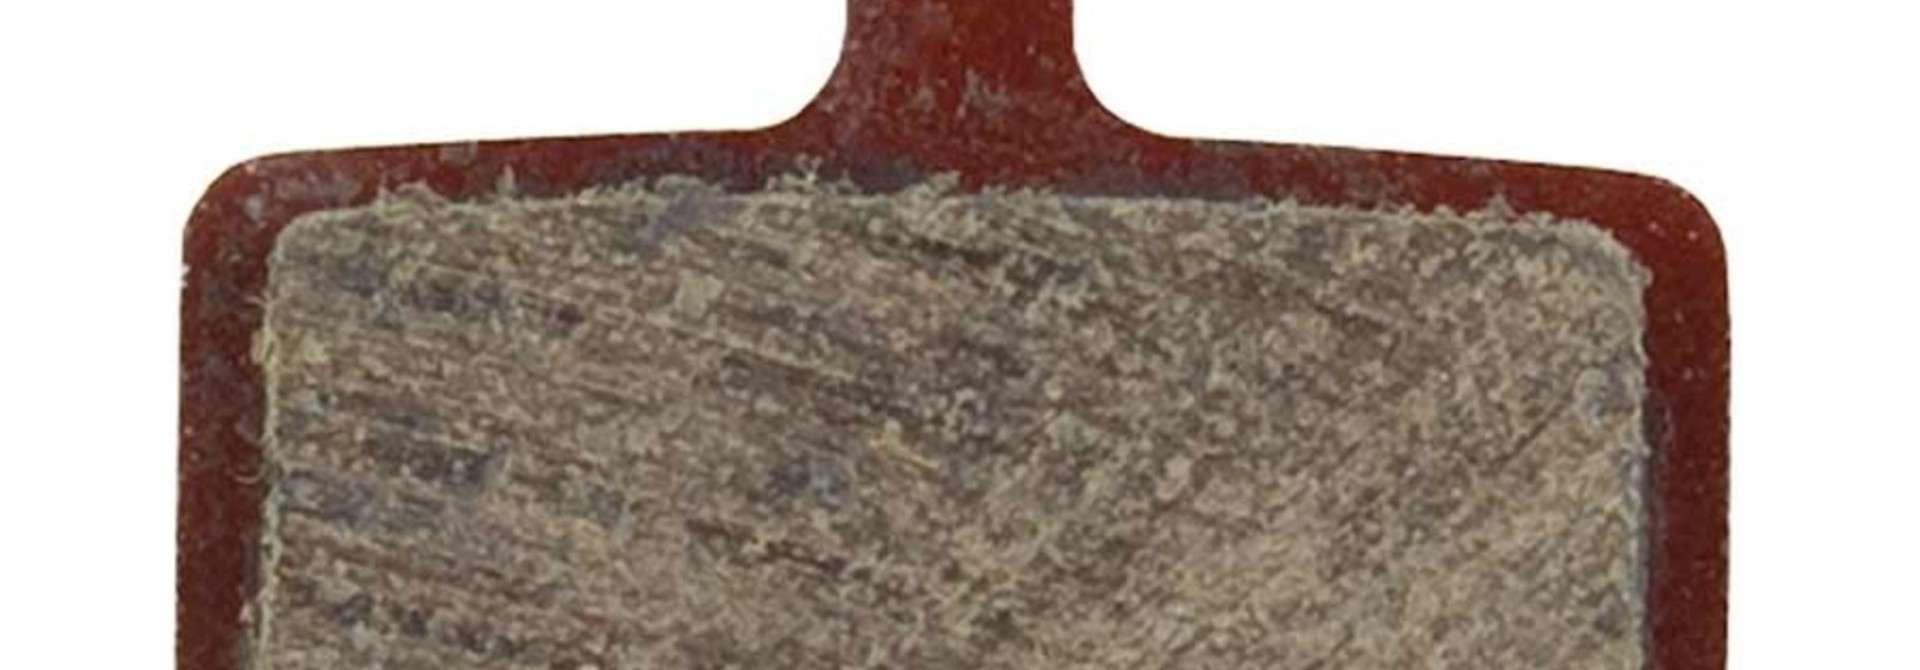 SRAM, 00.5315.035.020, Disc Brake Pads, Shape: Avid Elixir/SRAM Level/Force AXS HRD, Organic, Pair